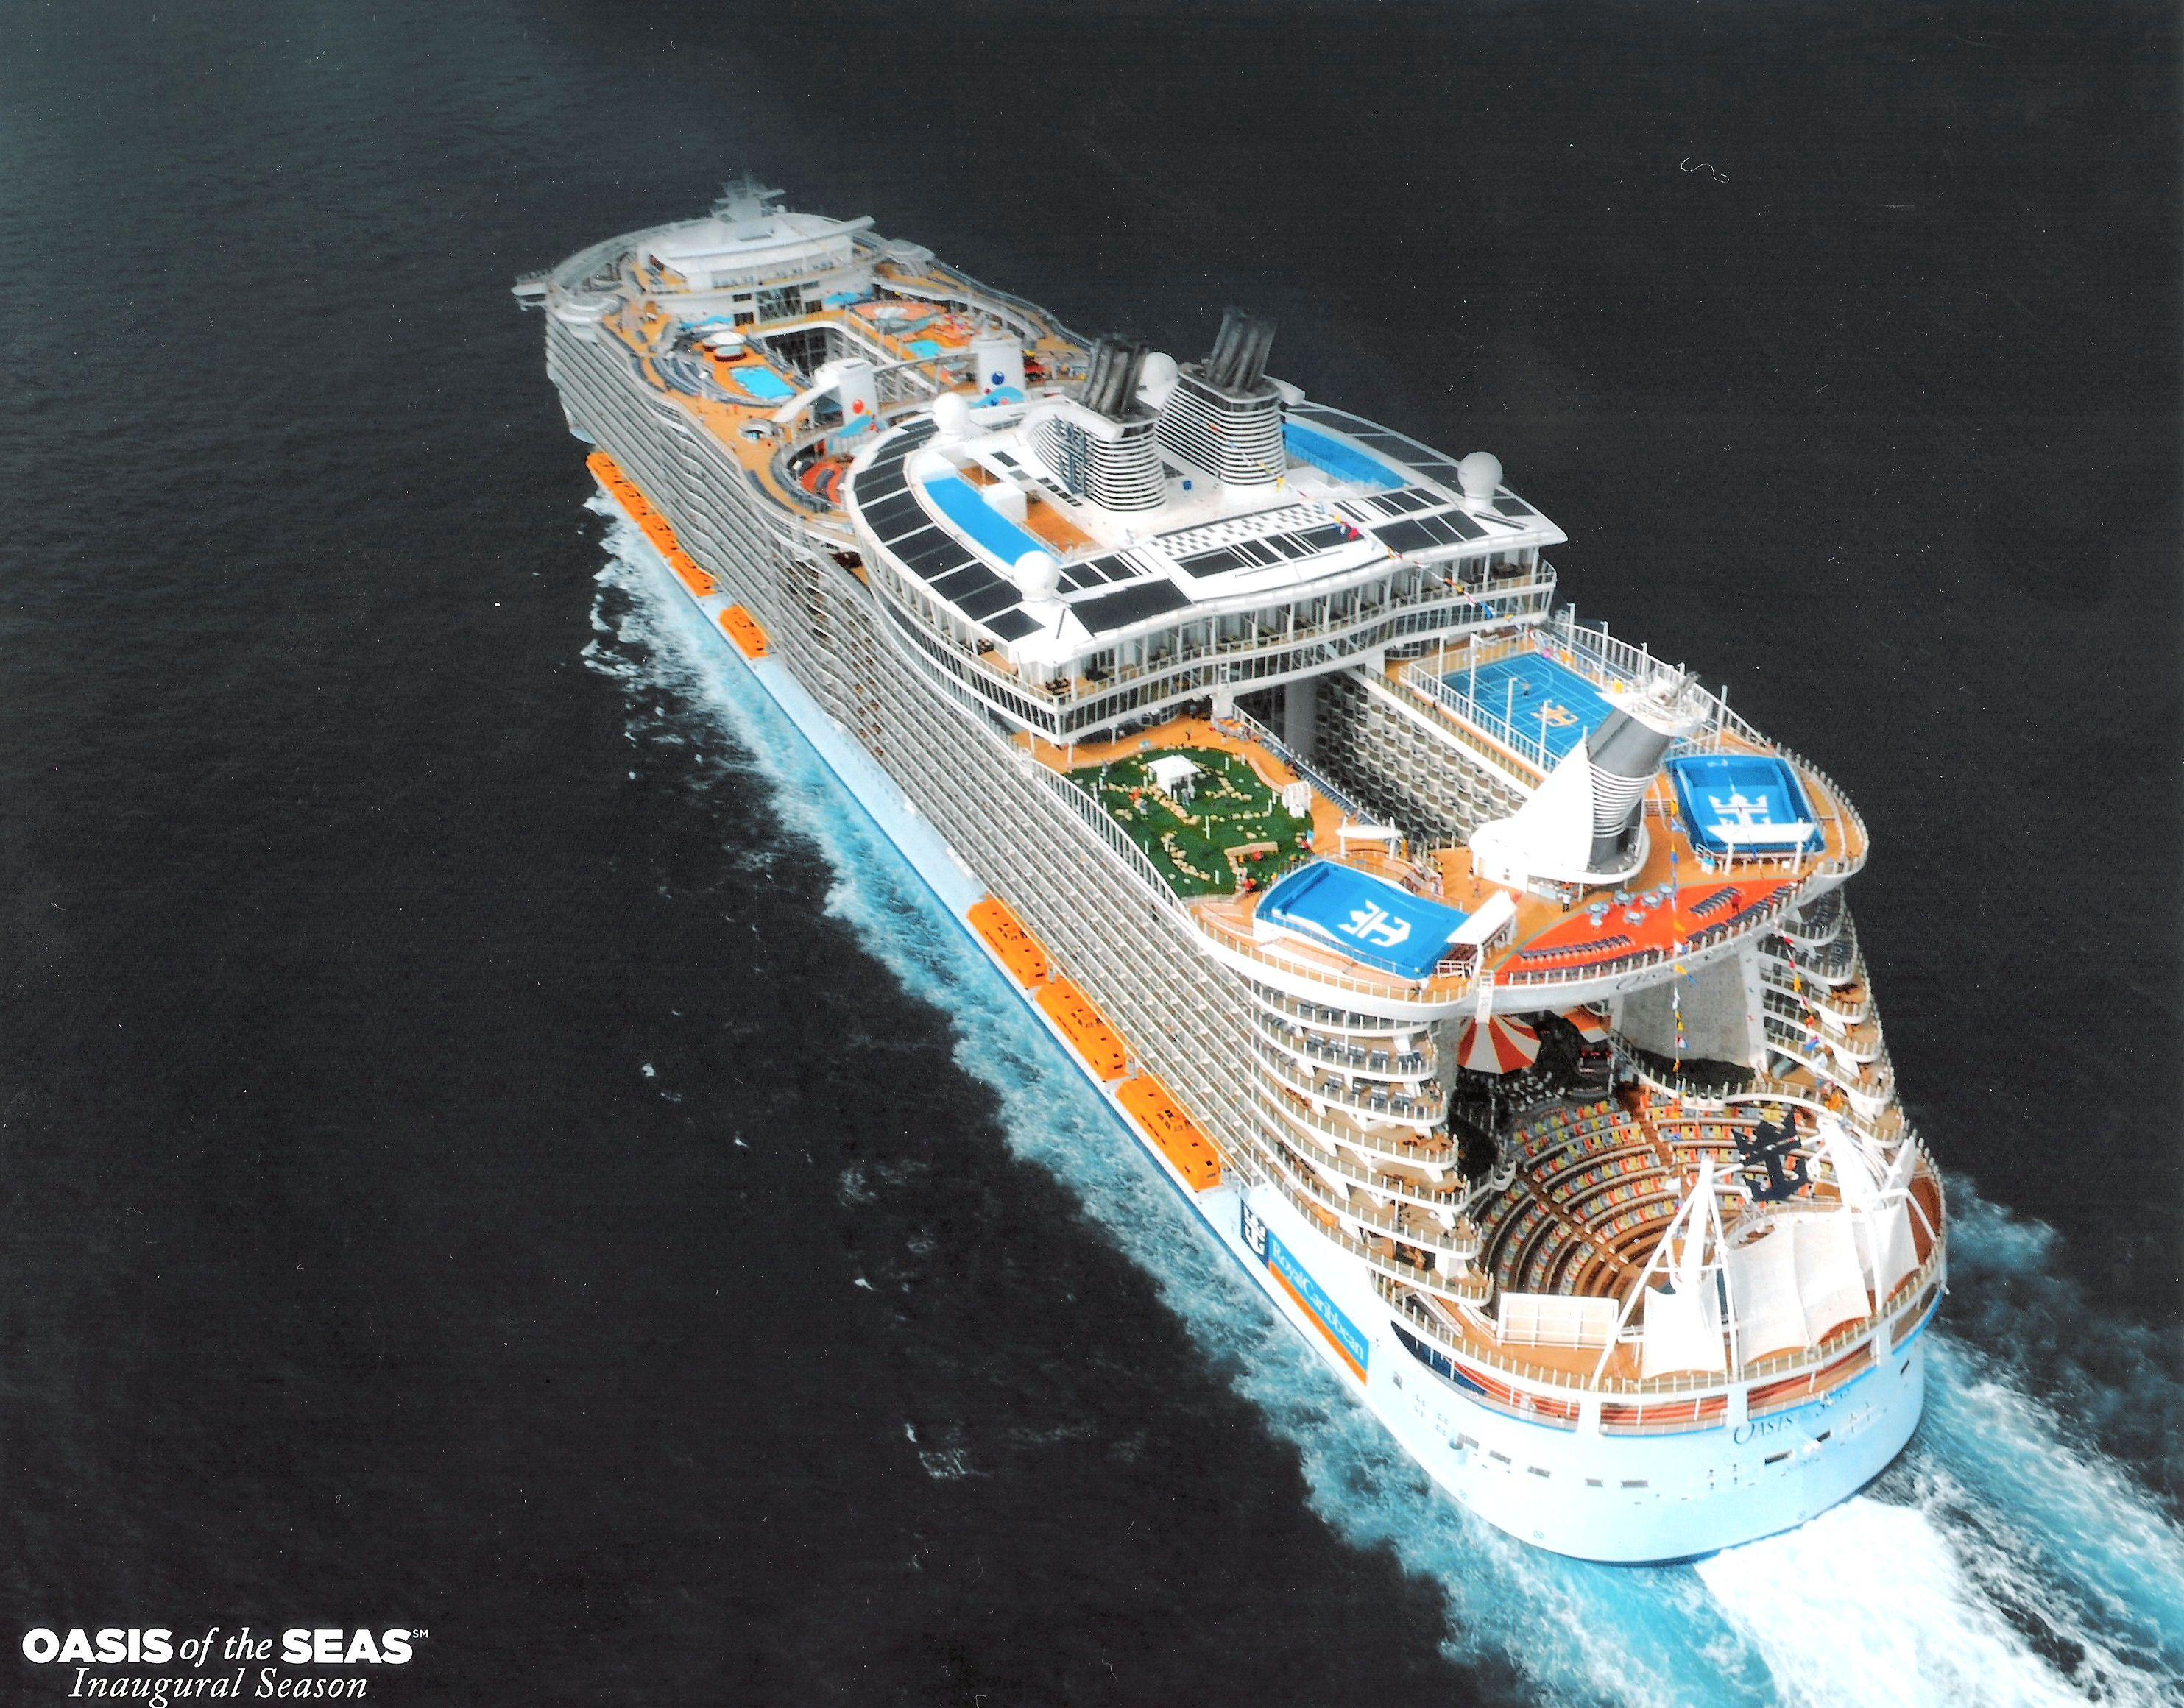 Oasis of the seas!!!!!!!!!!!!!!!!!!!!!!!!!!!!!?